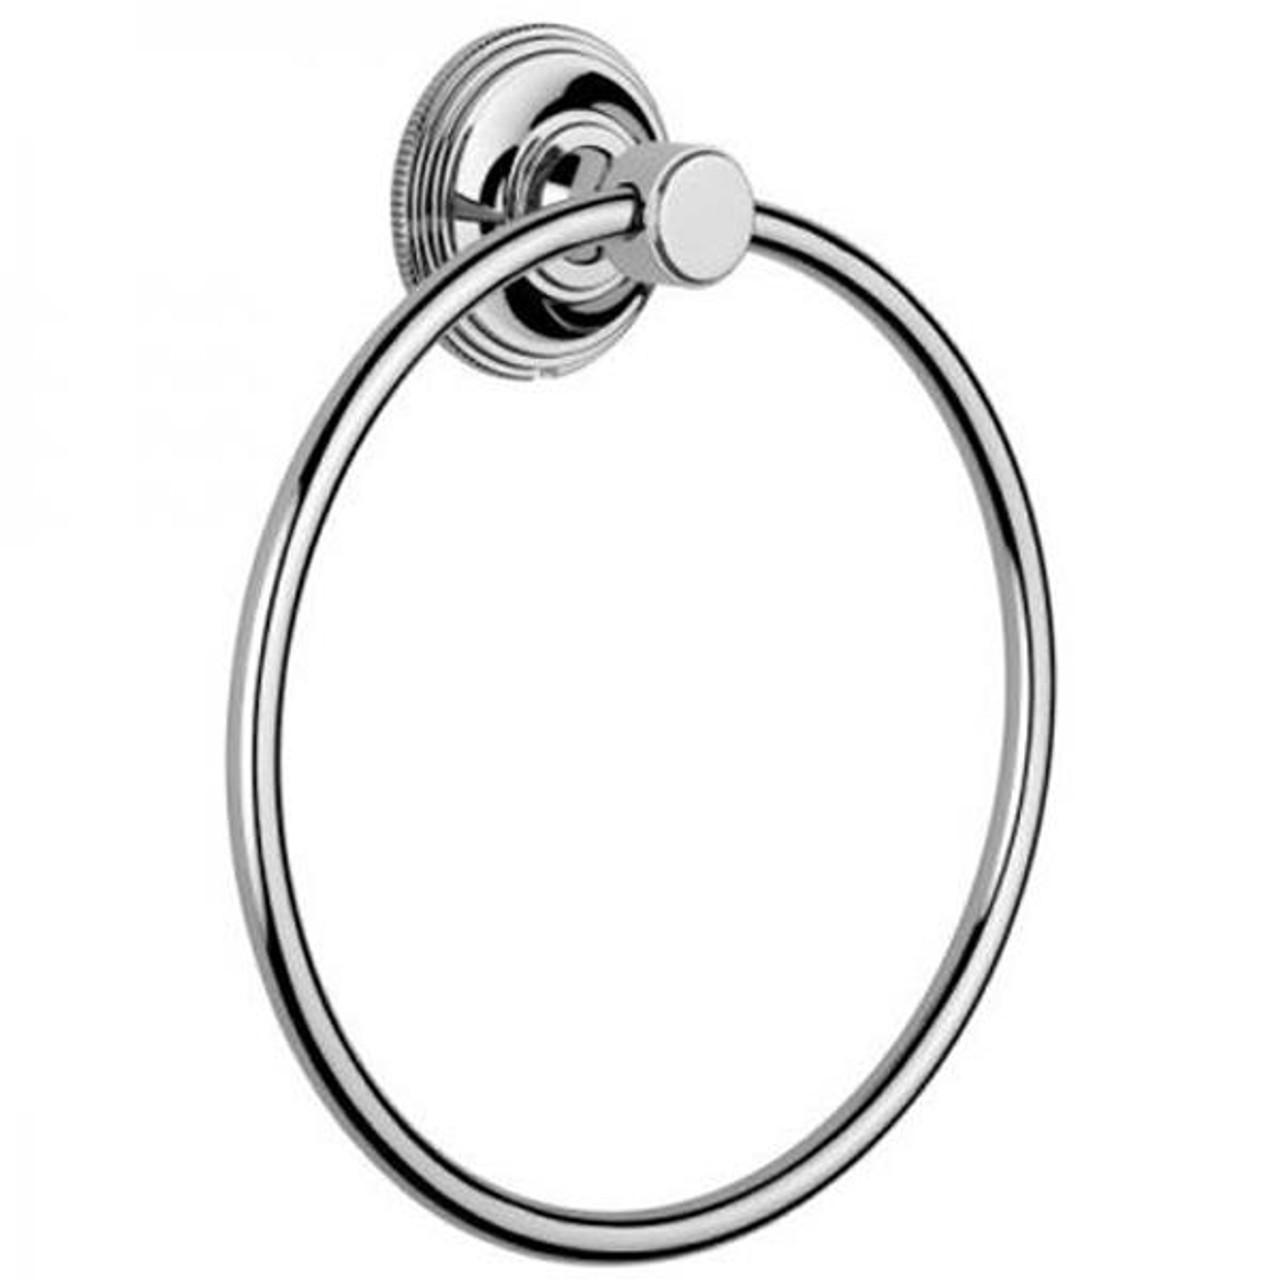 Chrome Plated Samuel Heath Style Moderne Towel Ring N6698